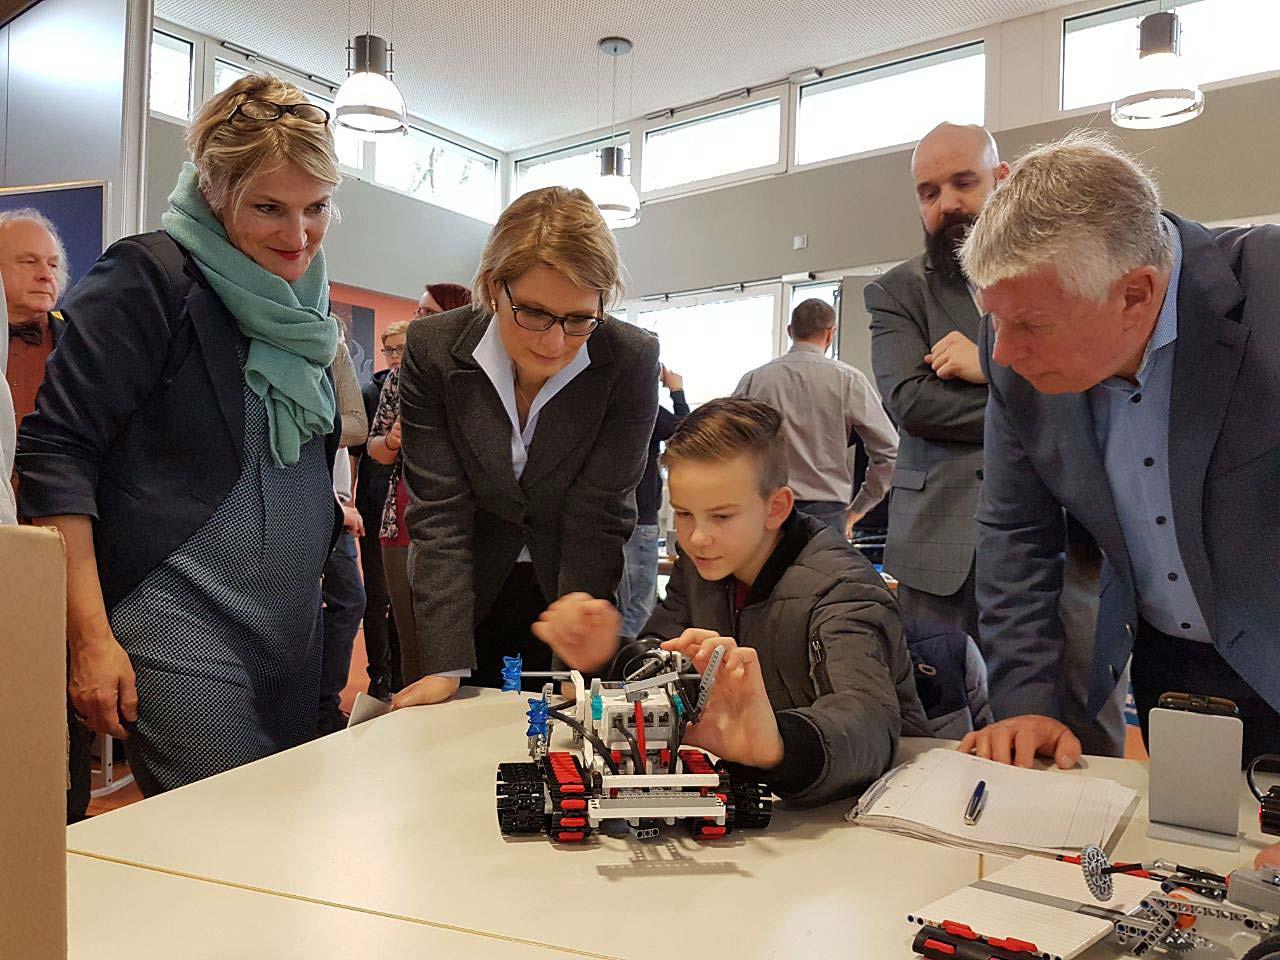 Robotertechnik weckt Begeisterung